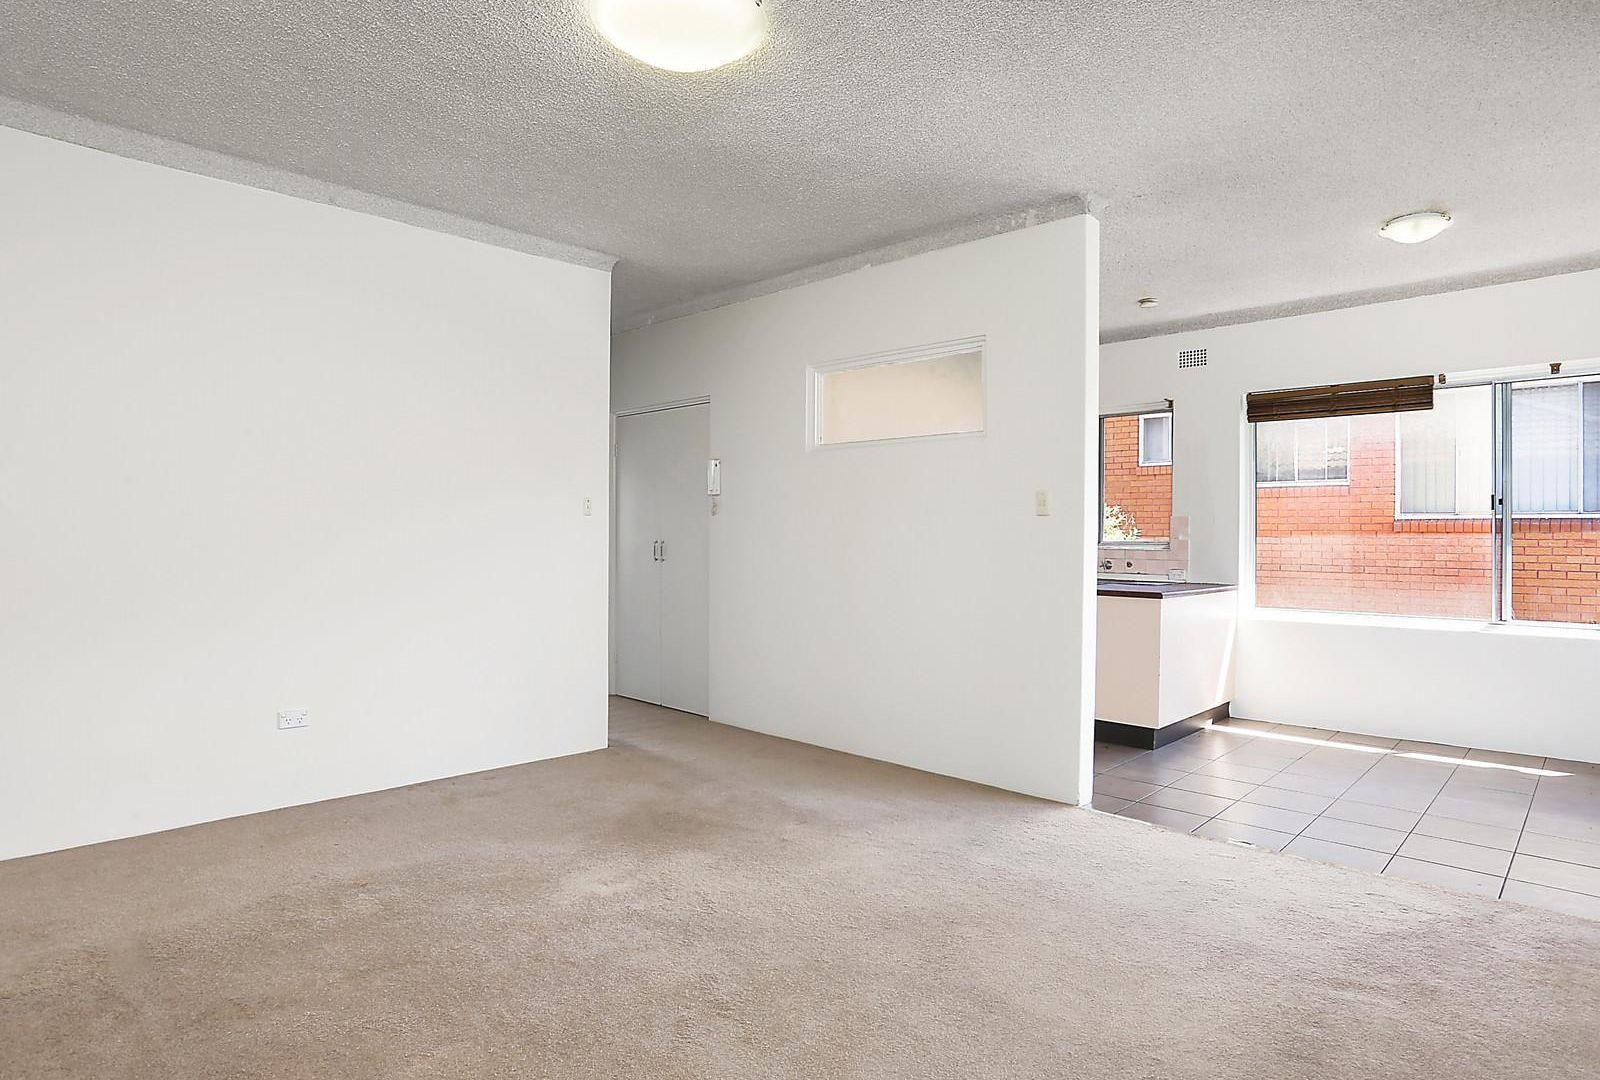 15/5 Baxter Avenue, Kogarah NSW 2217, Image 2